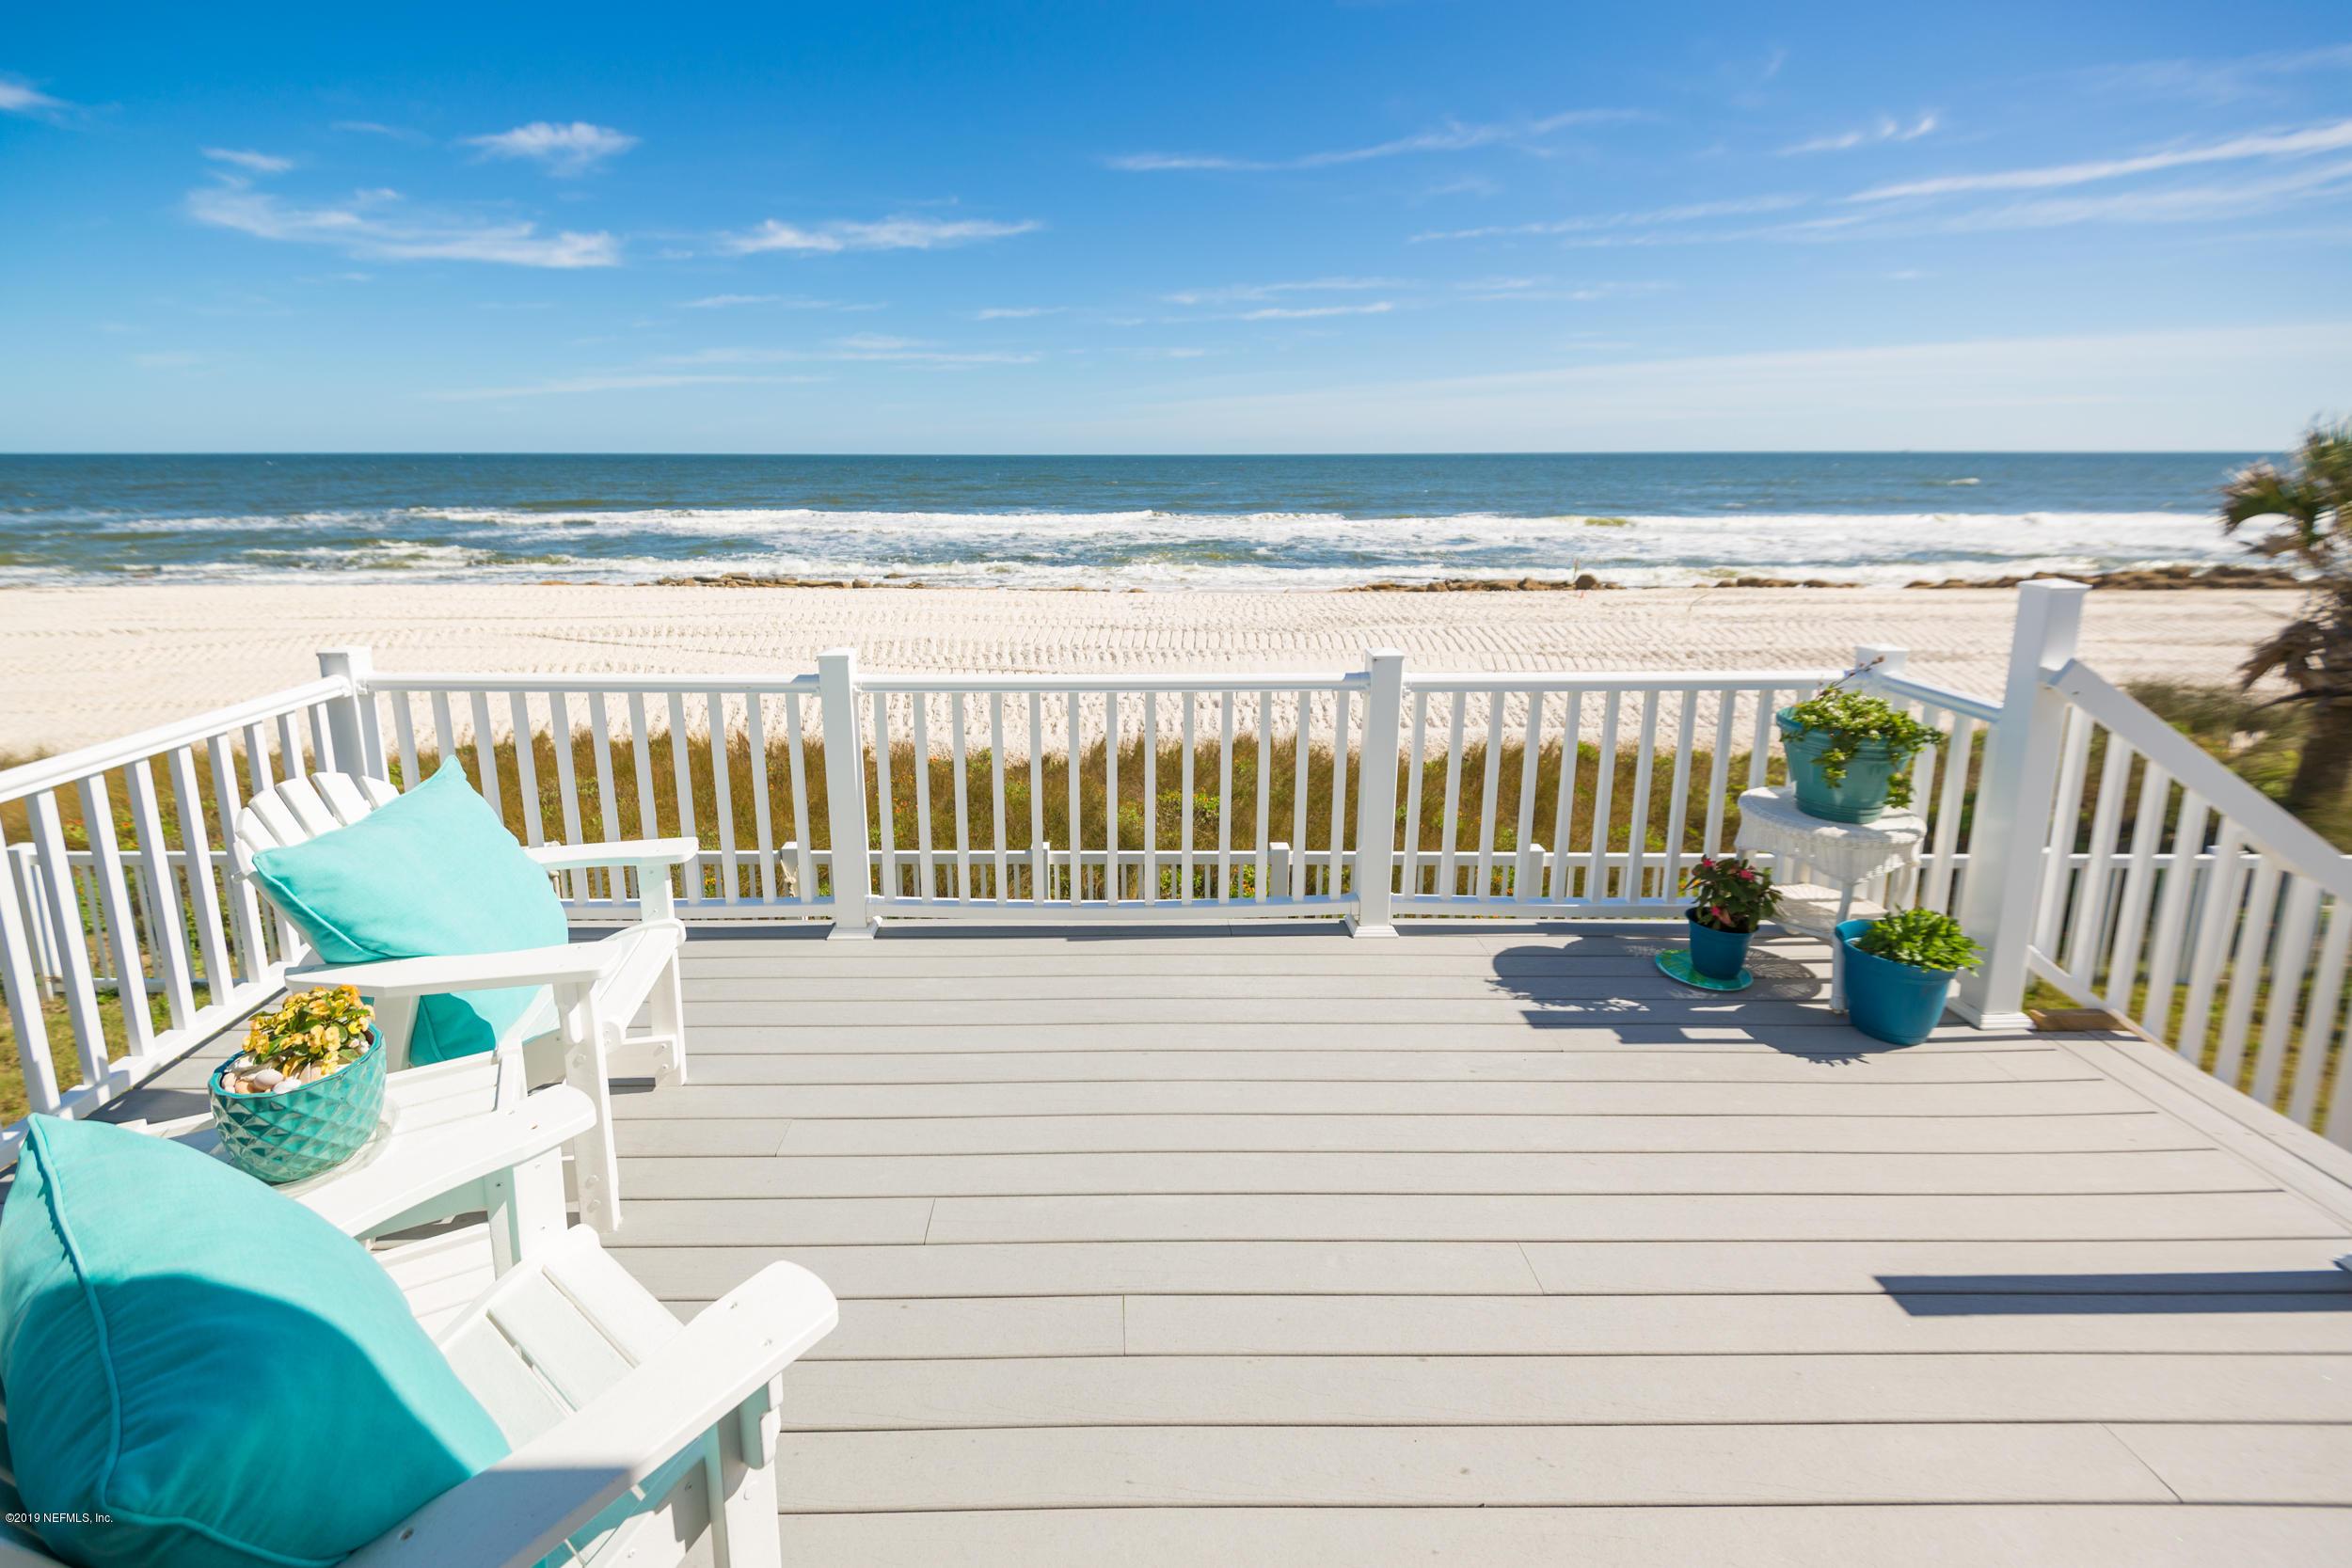 7077 OCEAN SHORE, PALM COAST, FLORIDA 32137, 3 Bedrooms Bedrooms, ,2 BathroomsBathrooms,Residential - single family,For sale,OCEAN SHORE,980259